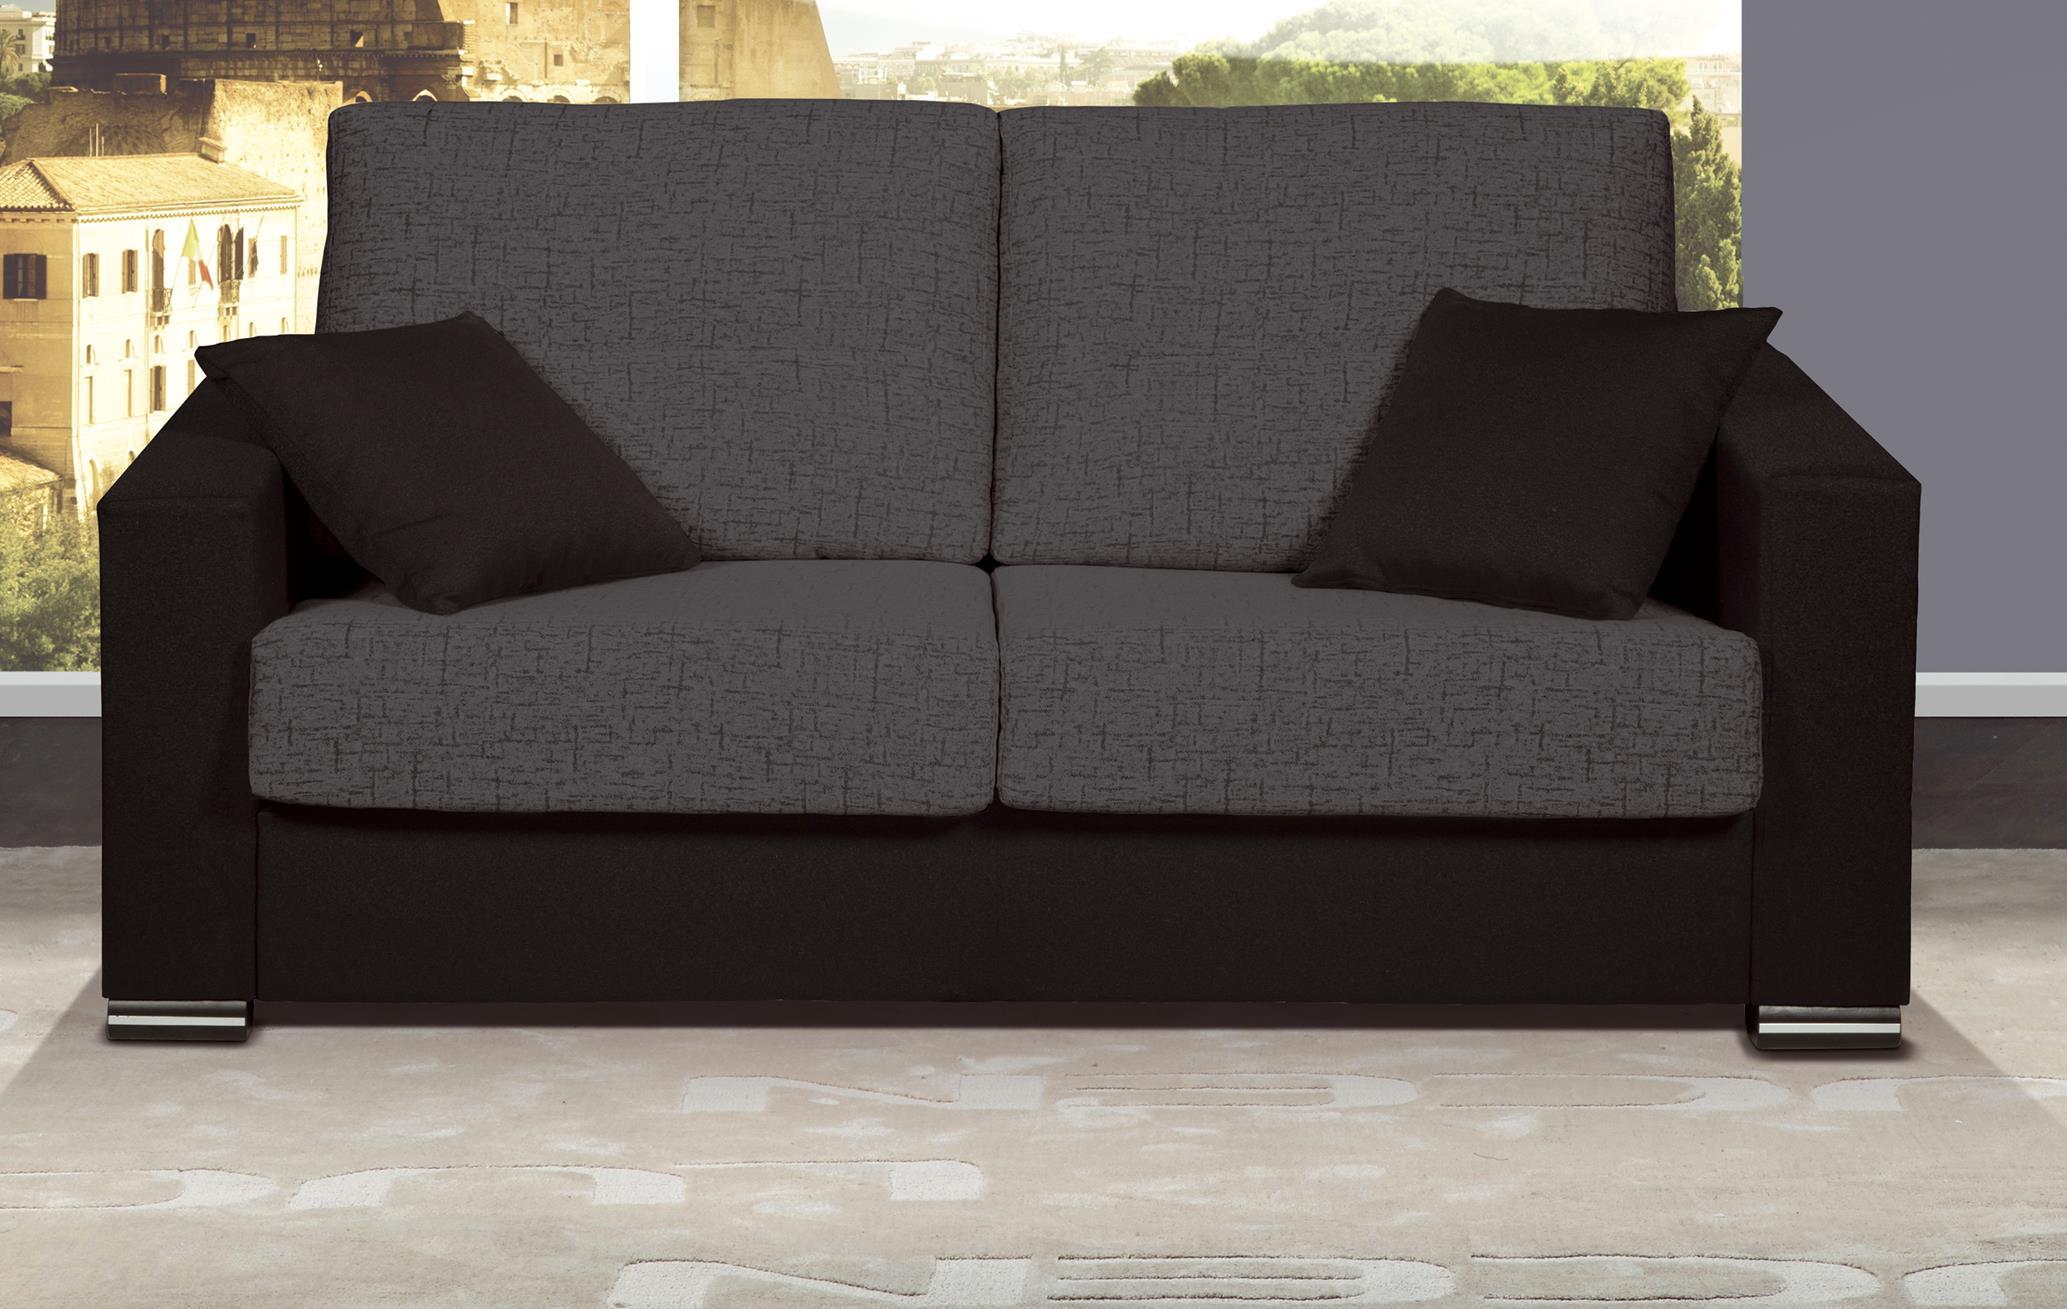 sof cama 3 plazas sistema italiano muebles bandama